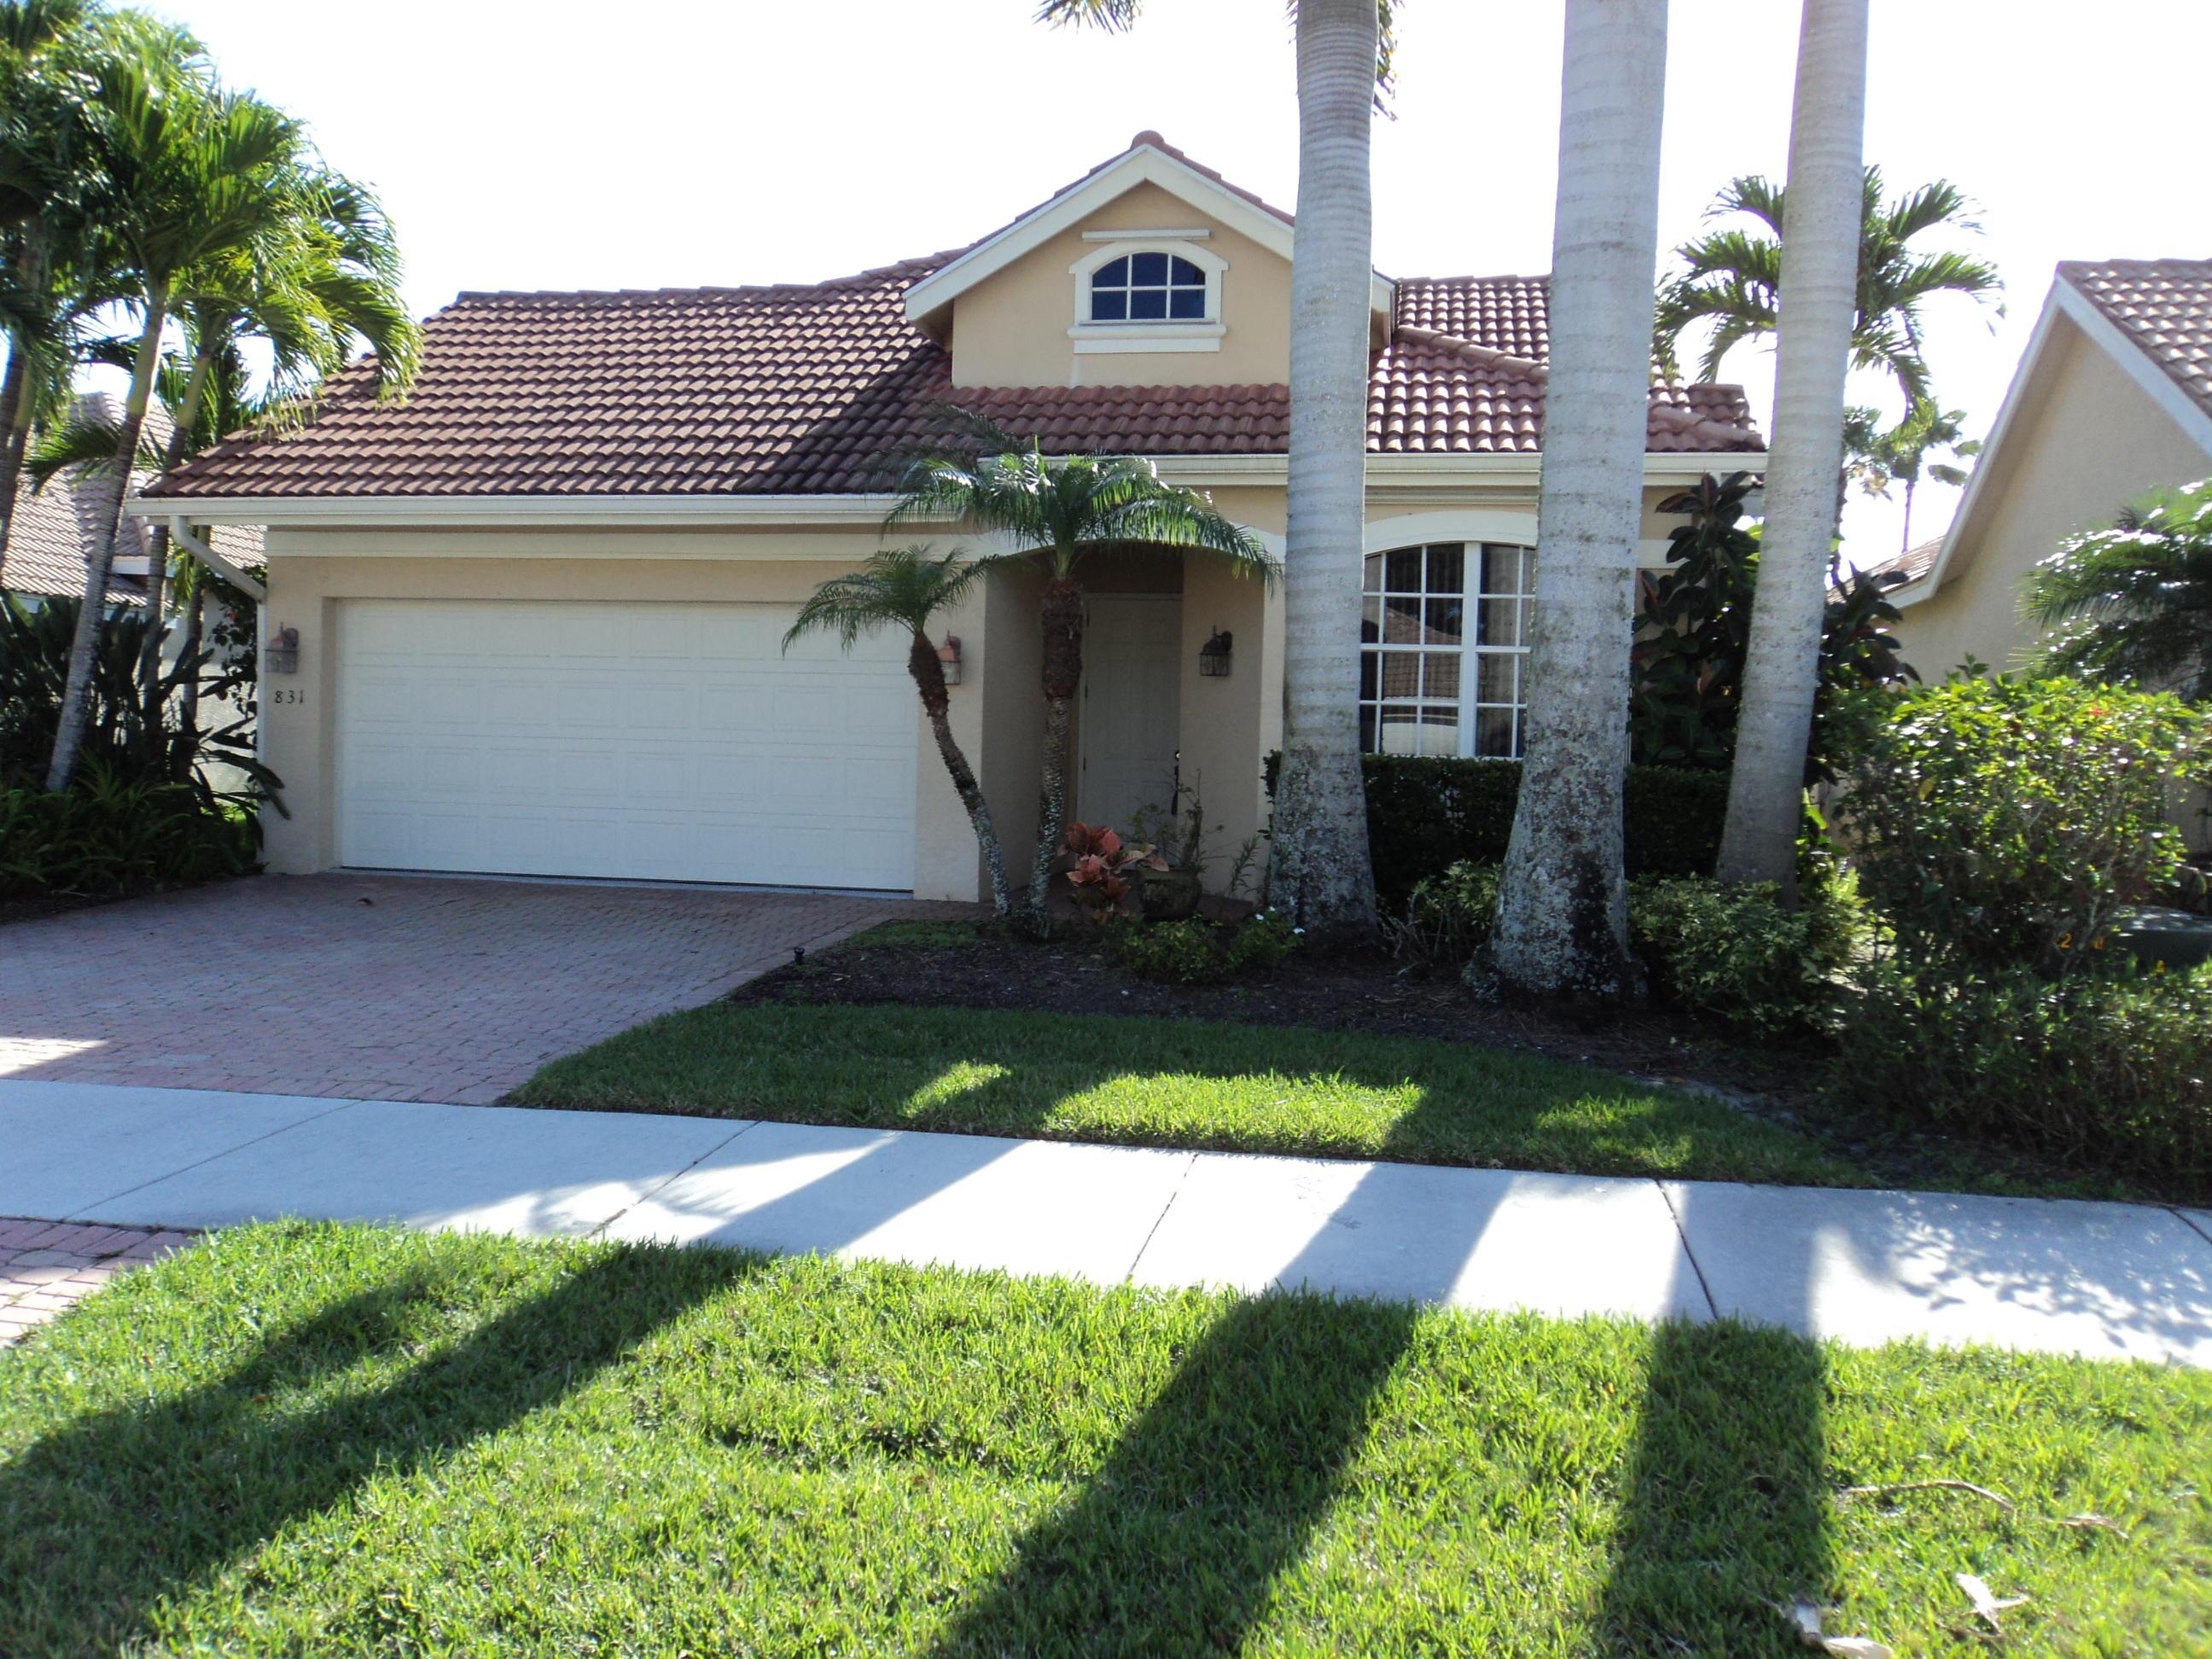 831 Sw Munjack Circle, Port Saint Lucie, FL 34986